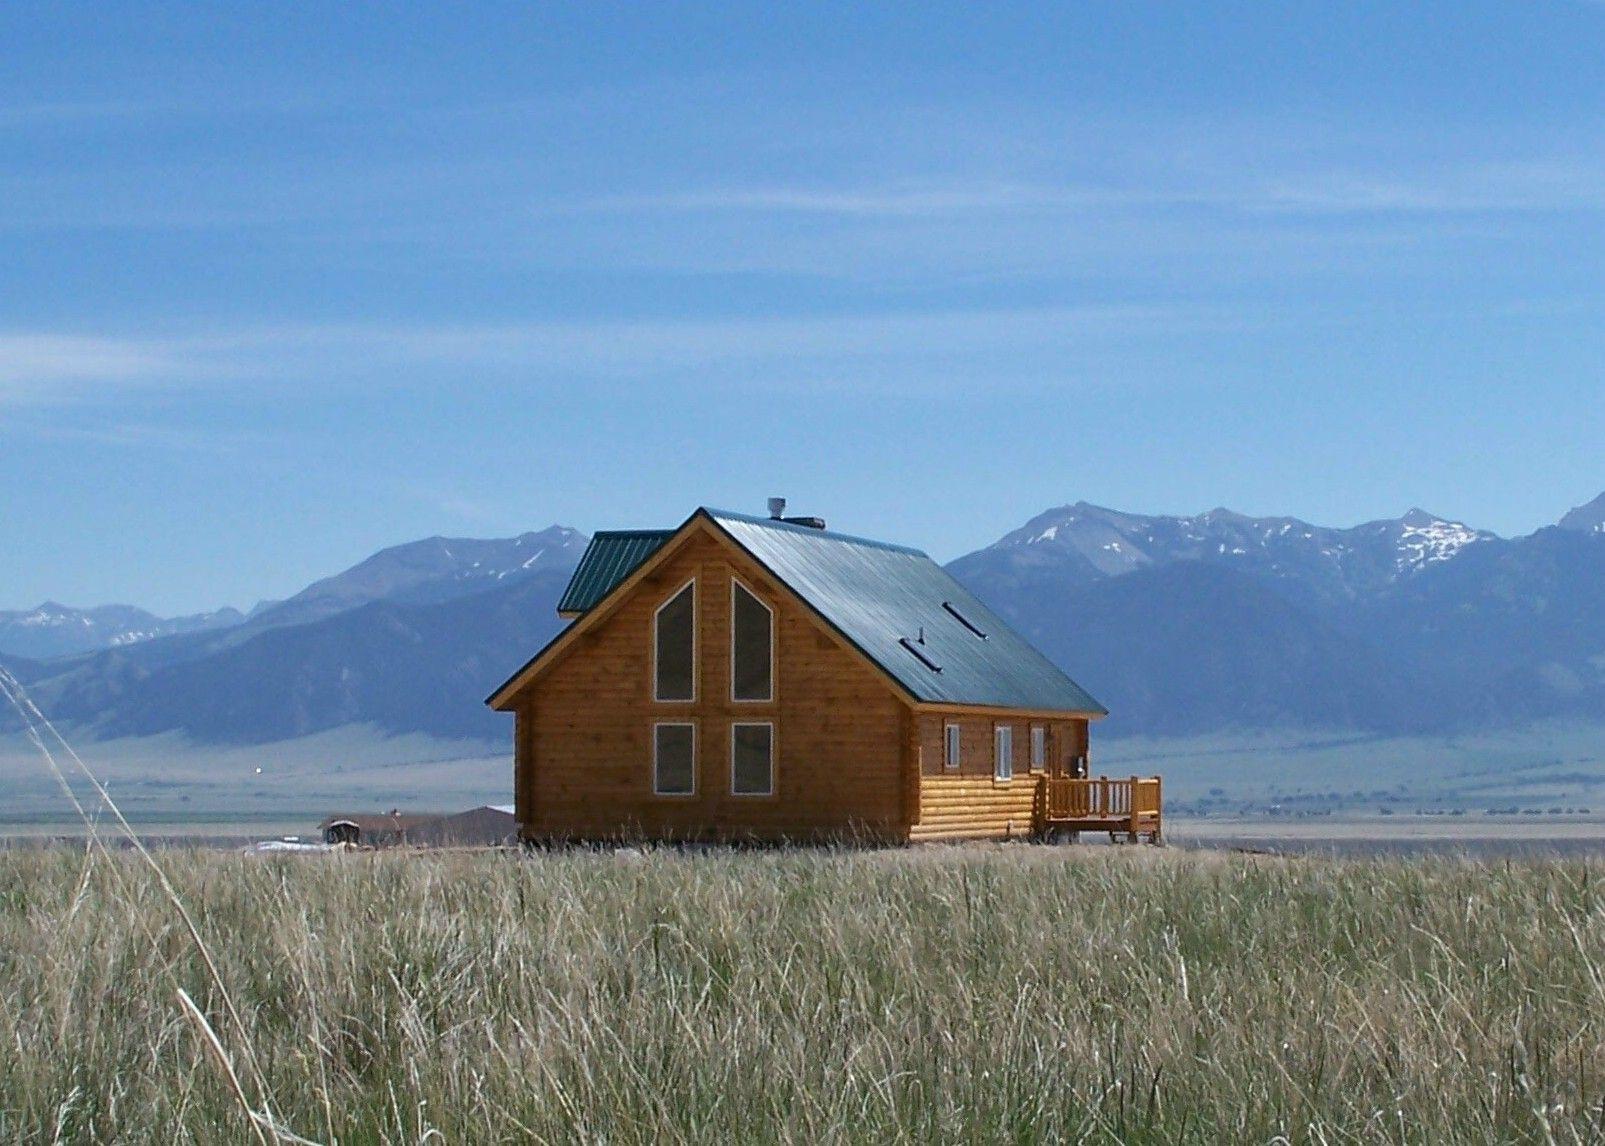 Cowboy Log Homes Cabin 1 Back Gallatin Floor Plan 1890 Sq Ft.